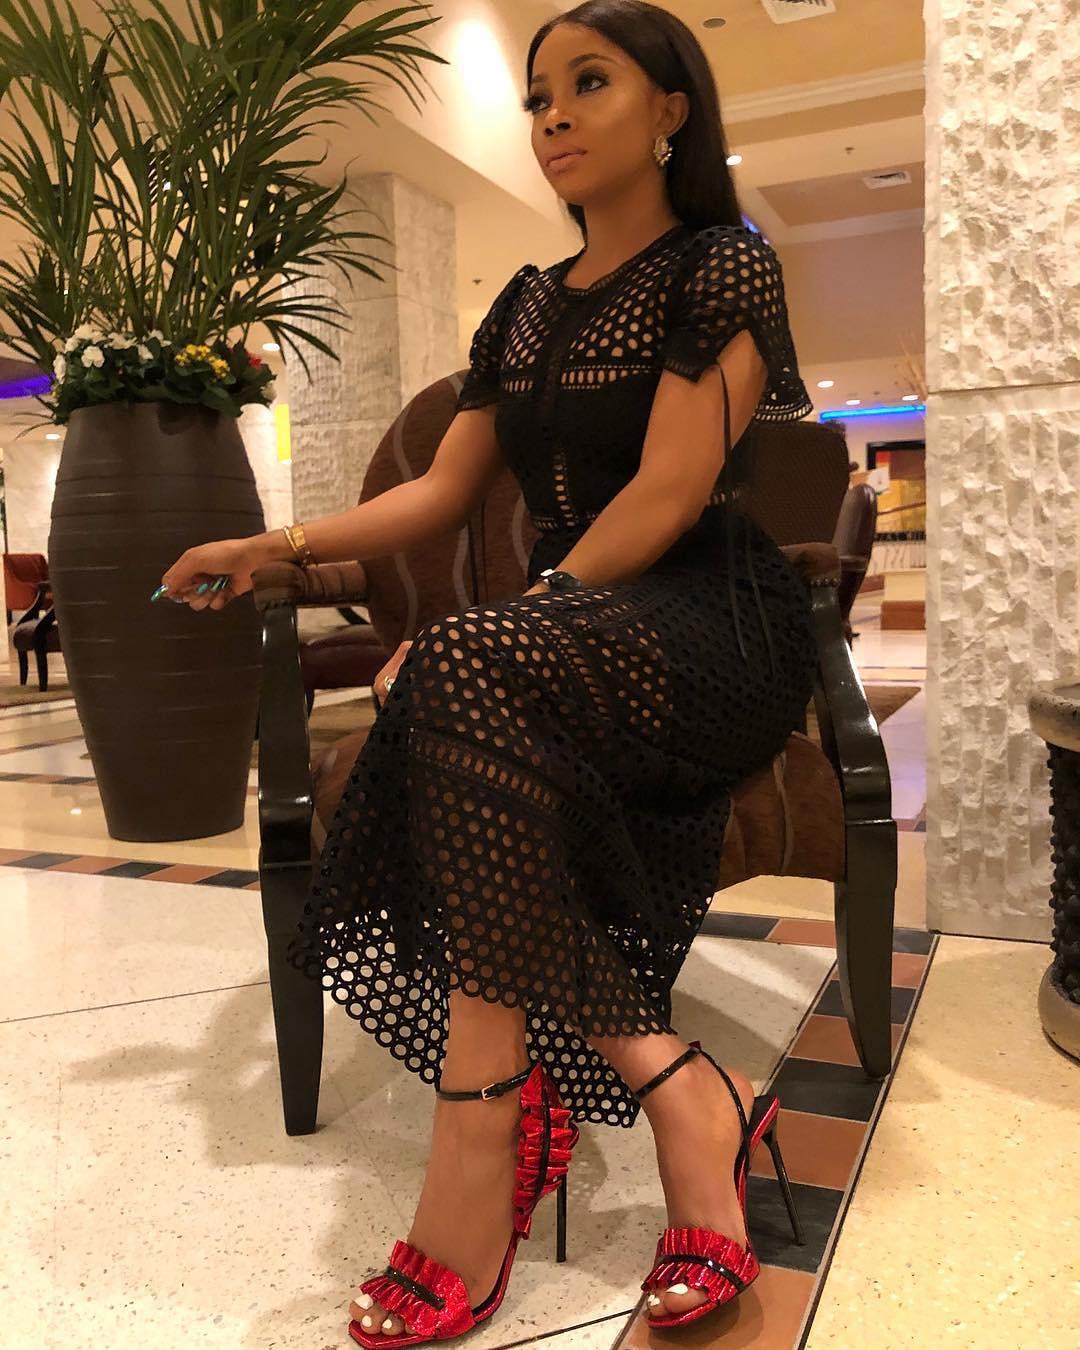 25005656_1853653731330204_5328630422223978496_n Photos: Celebrities at The Future Awards Africa 2017 | #TFAA2017 Celebrities Entertainment